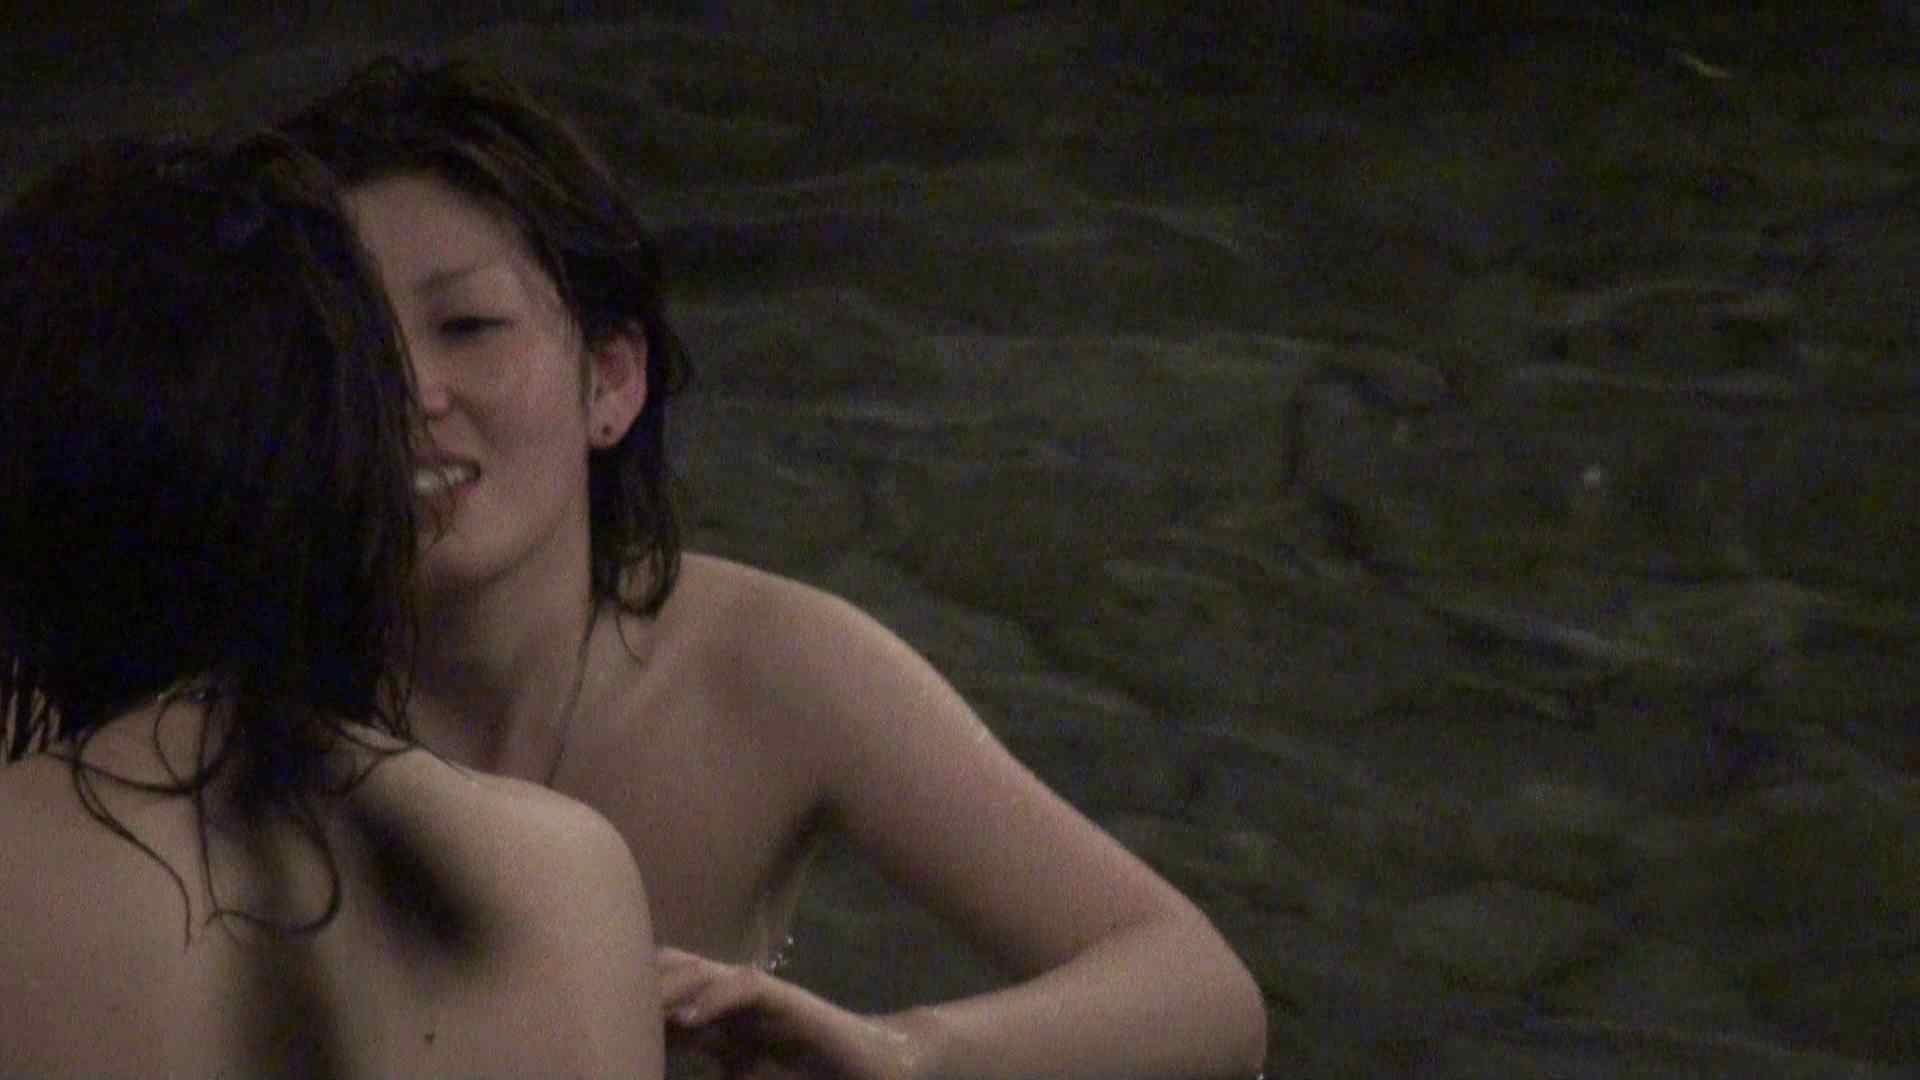 Aquaな露天風呂Vol.376 0  47連発 20